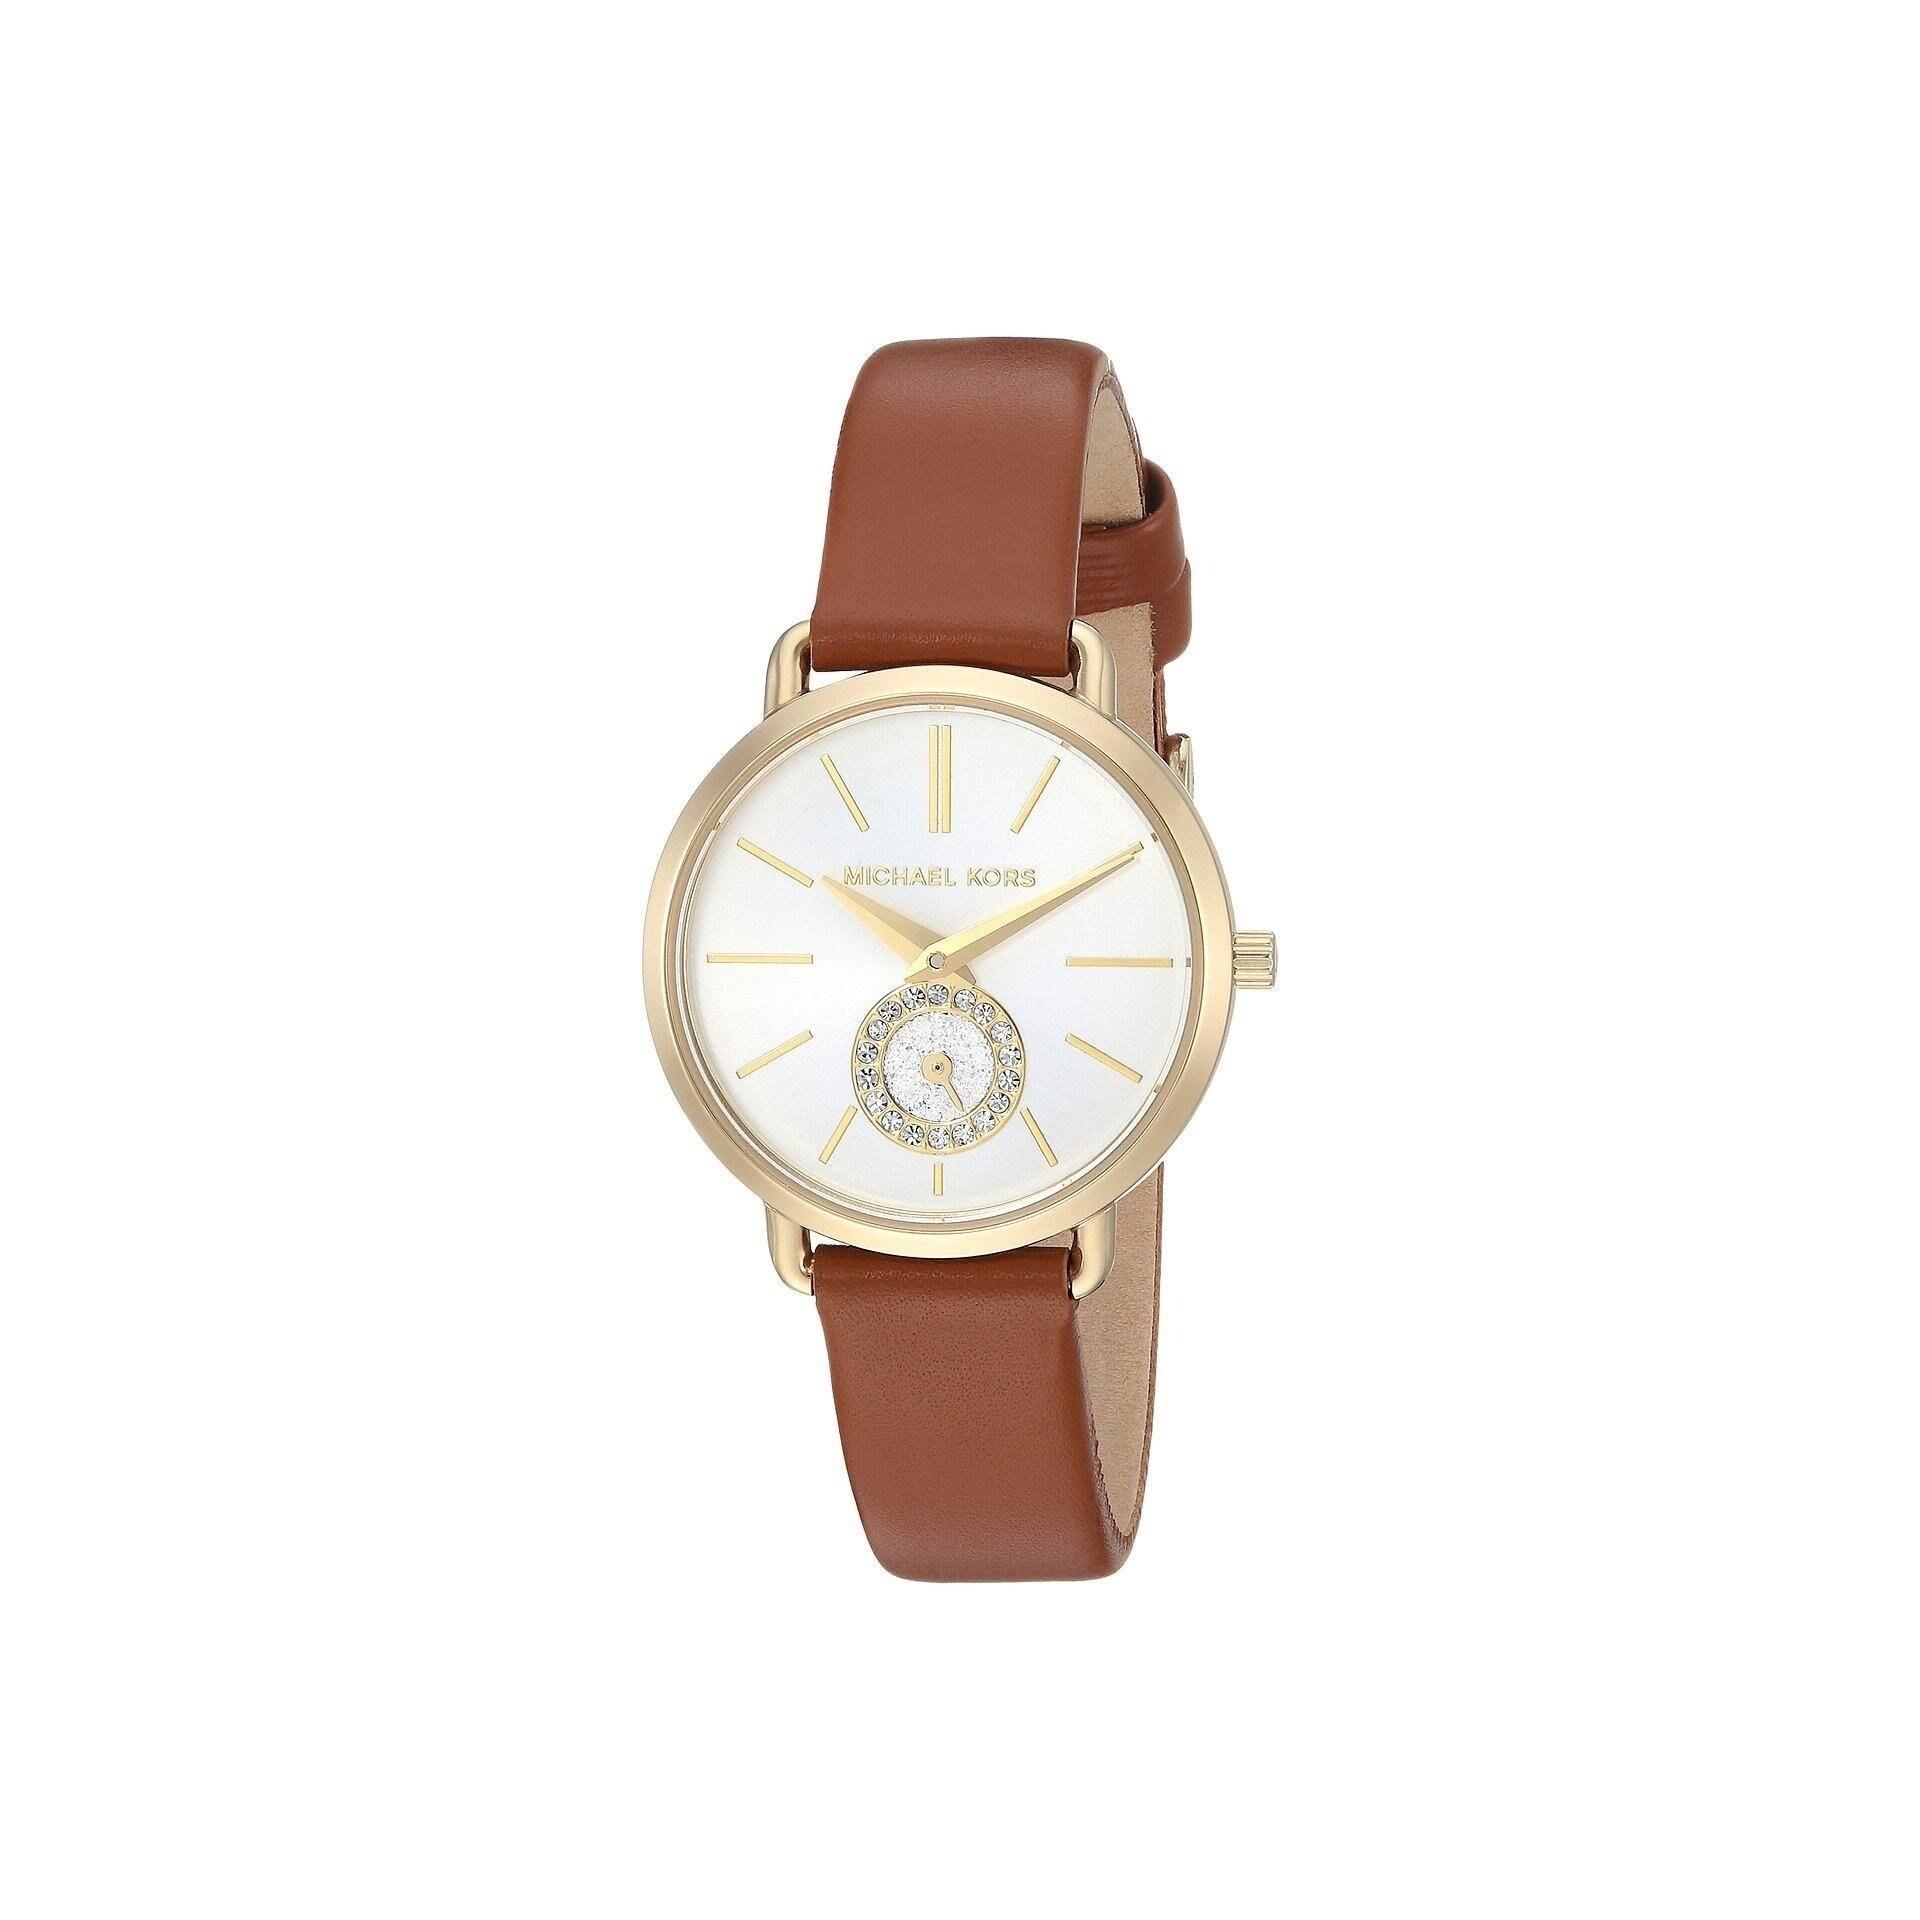 Michael Kors Womens MK2734 Portia Crystal Brown Leather Watch